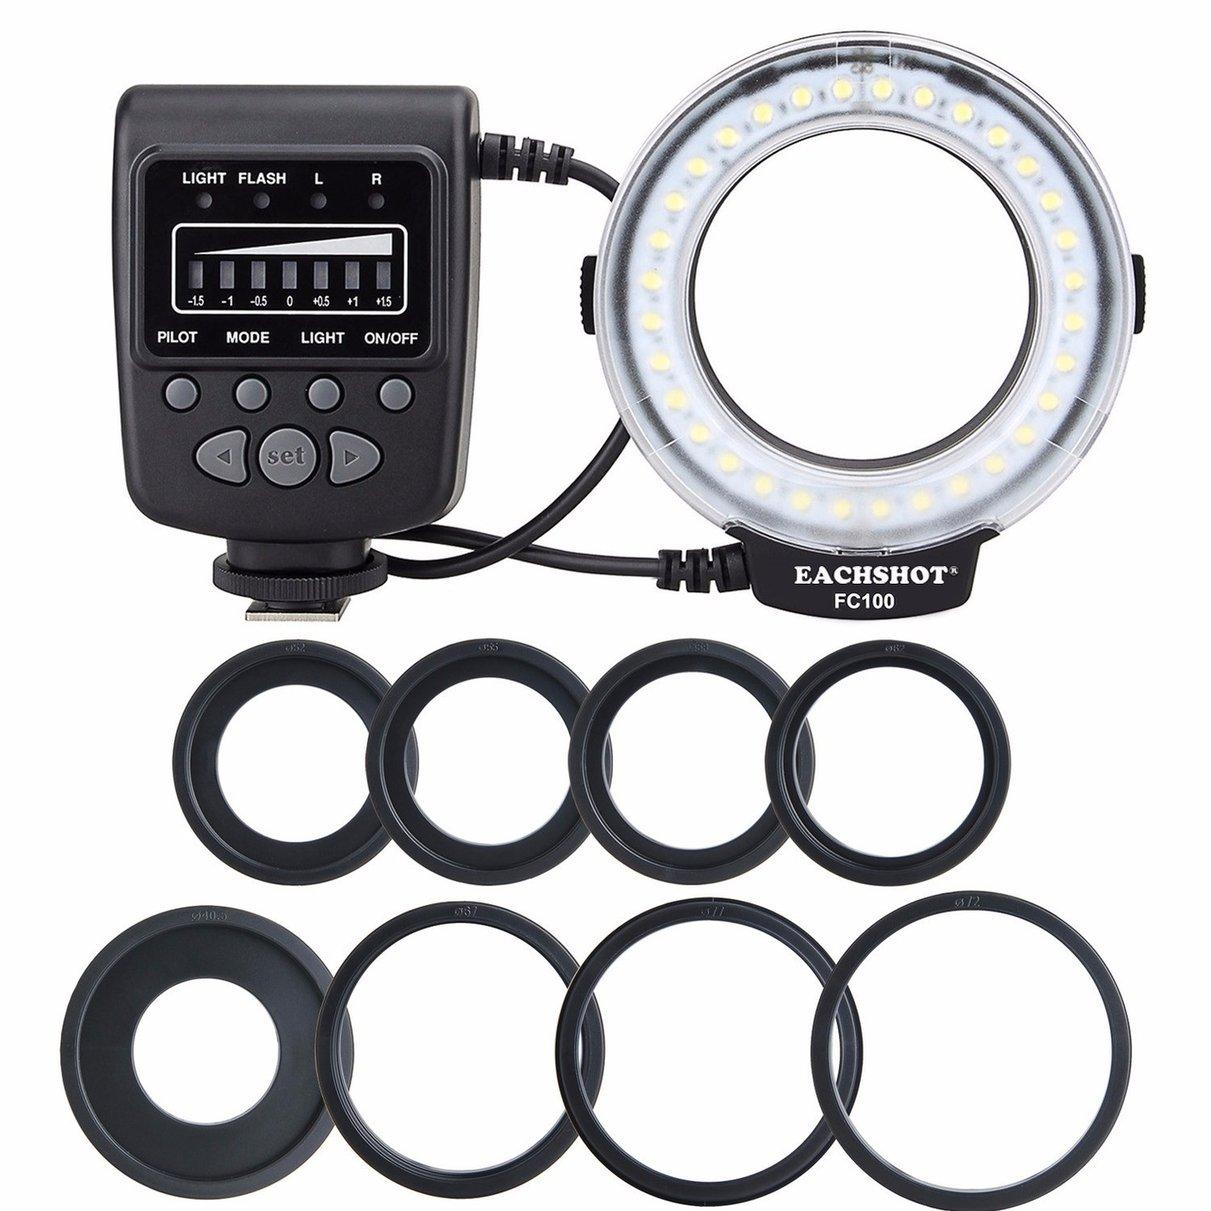 Meike FC-100 FC100 Macro Ring Flash/Luce MK FC 100 per Canon per EOS 650D 600D 60D 7D 550D 1100D T5i T4i T3i T3